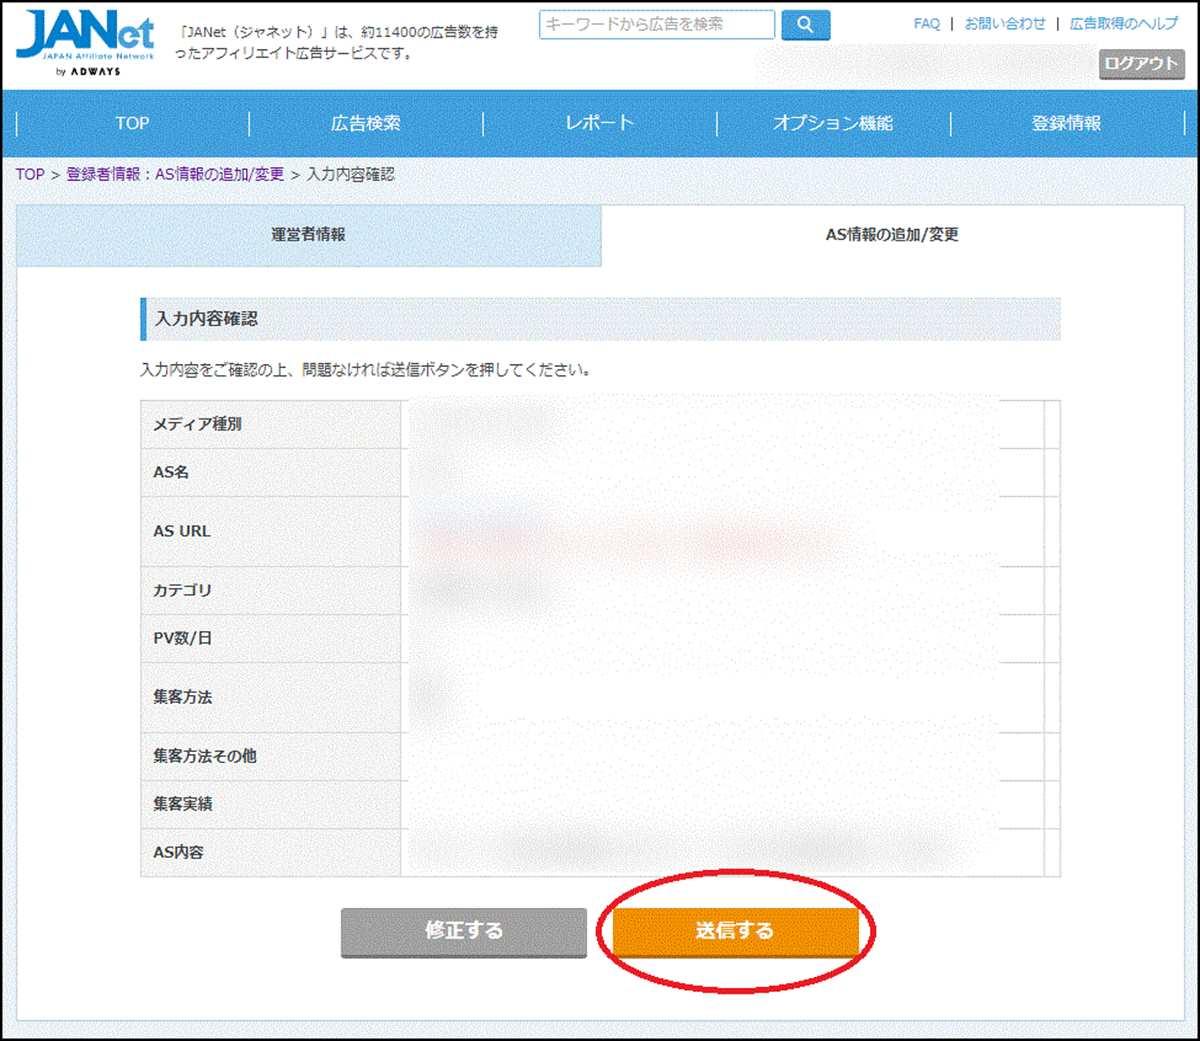 JANet(ジャネット)というASPに複数のサイトを登録する方法③:確認画面が表示されるので、問題なければ「送信する」をクリック